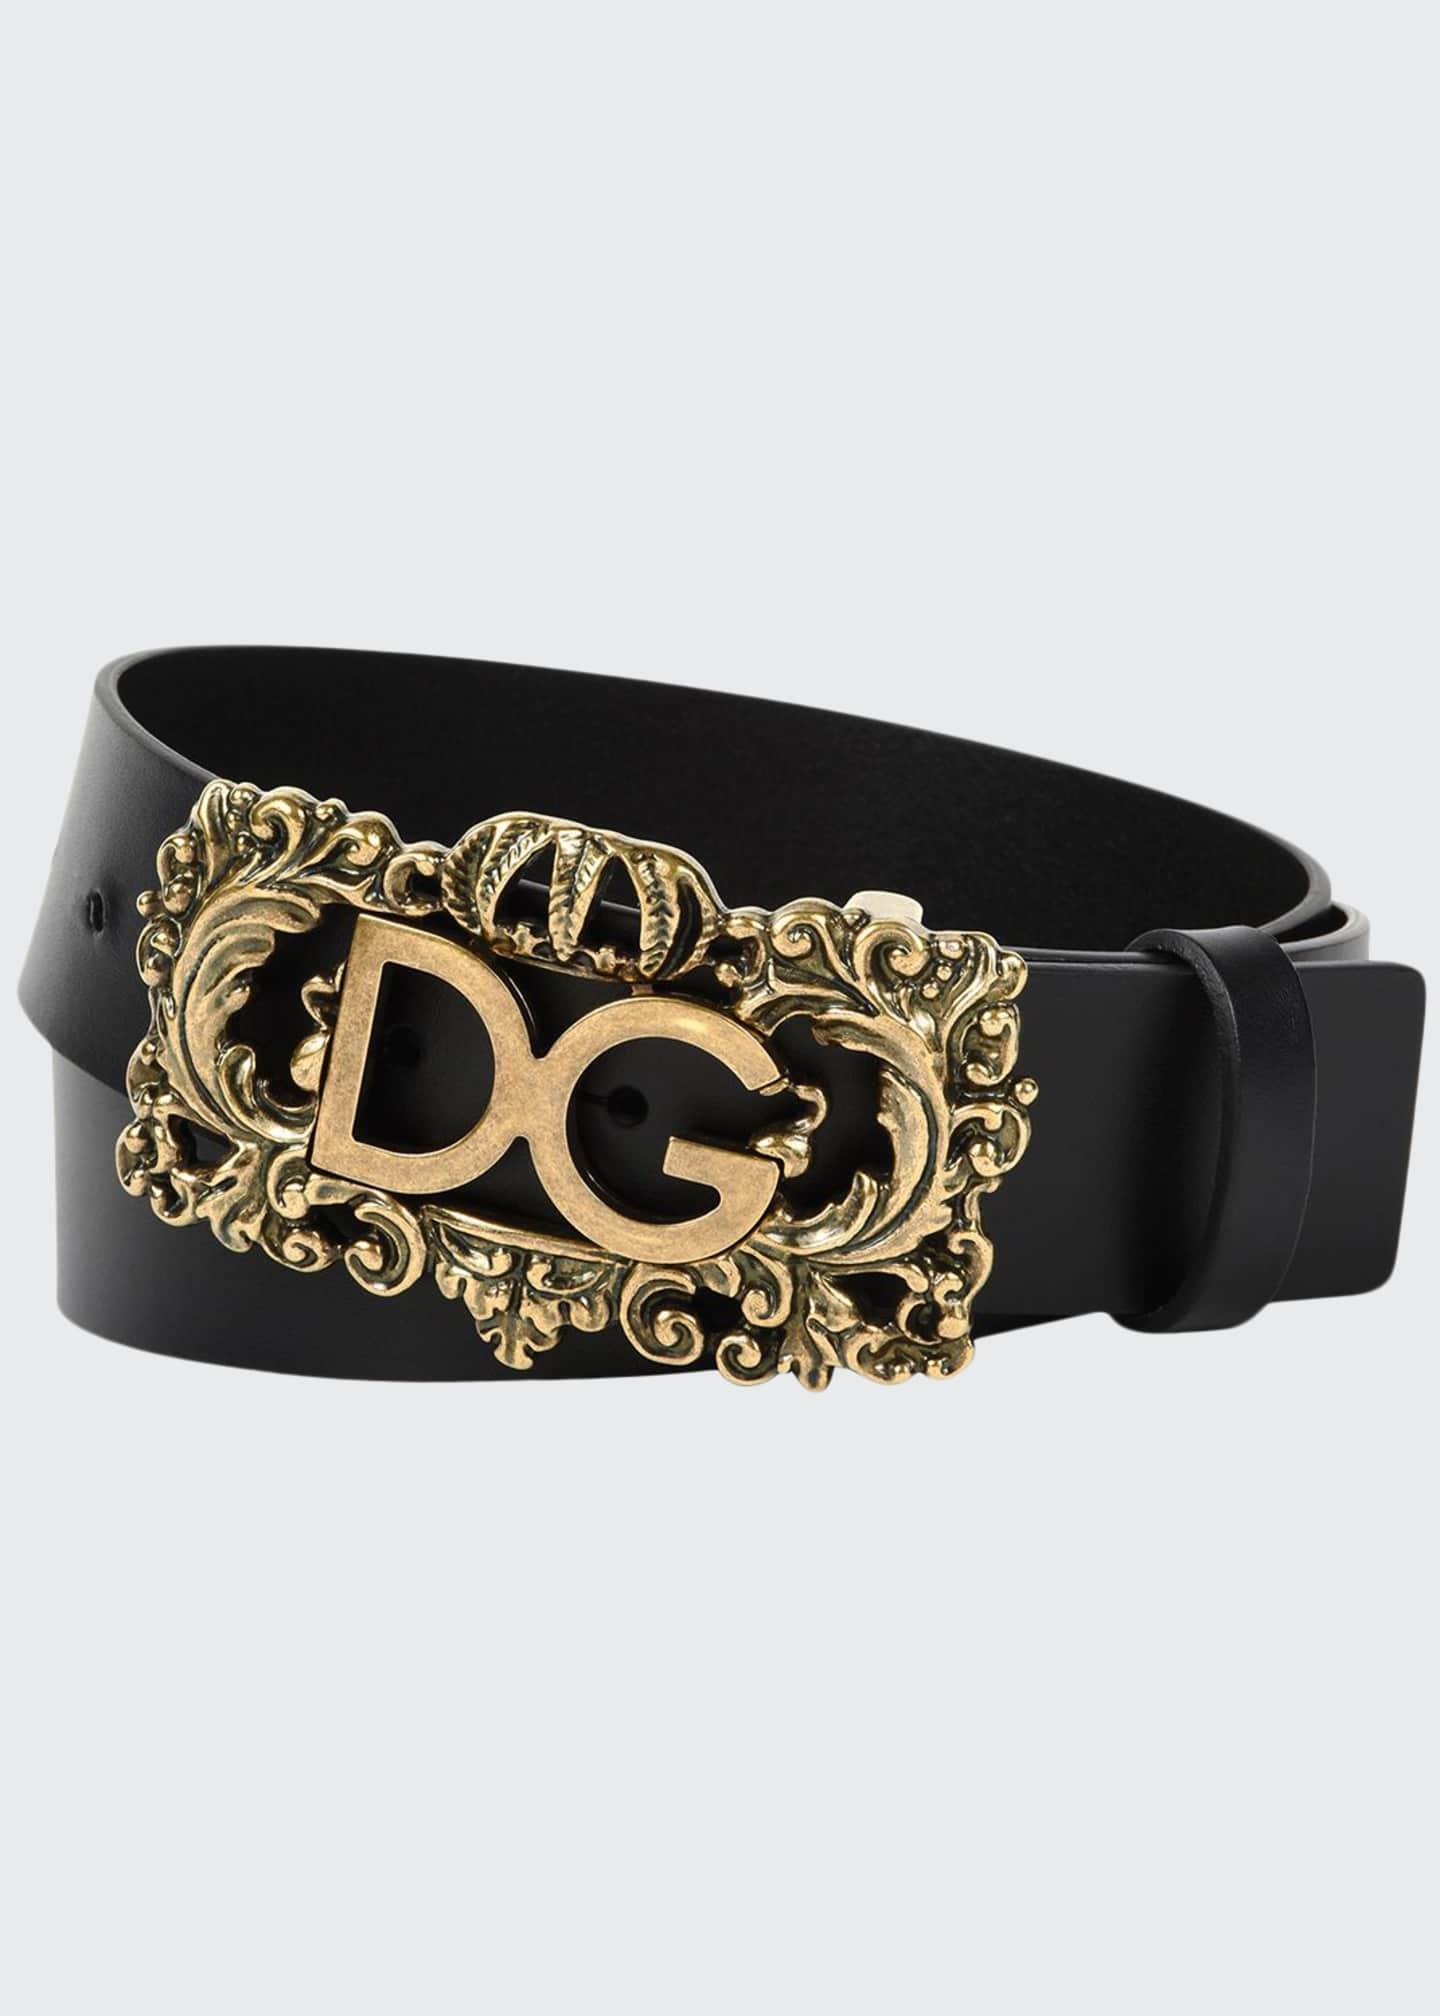 Dolce & Gabbana Men's Baroque Logo Leather Belt